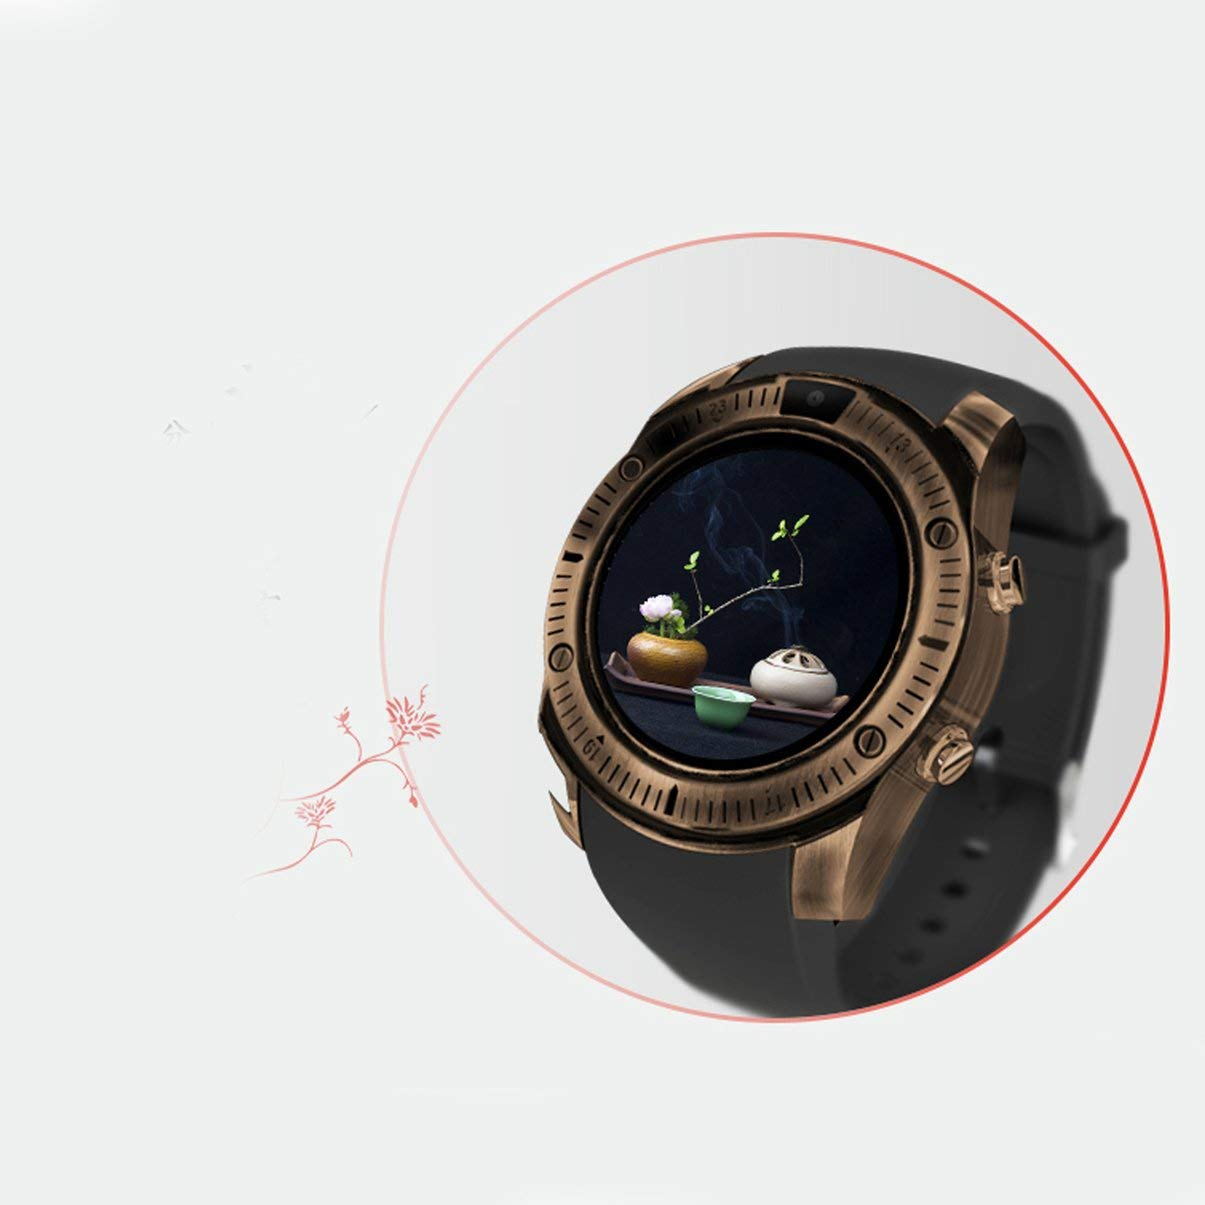 Reloj Inteligente para Internet Ky003 Reloj Inteligente para Adultos: Amazon.es: Relojes